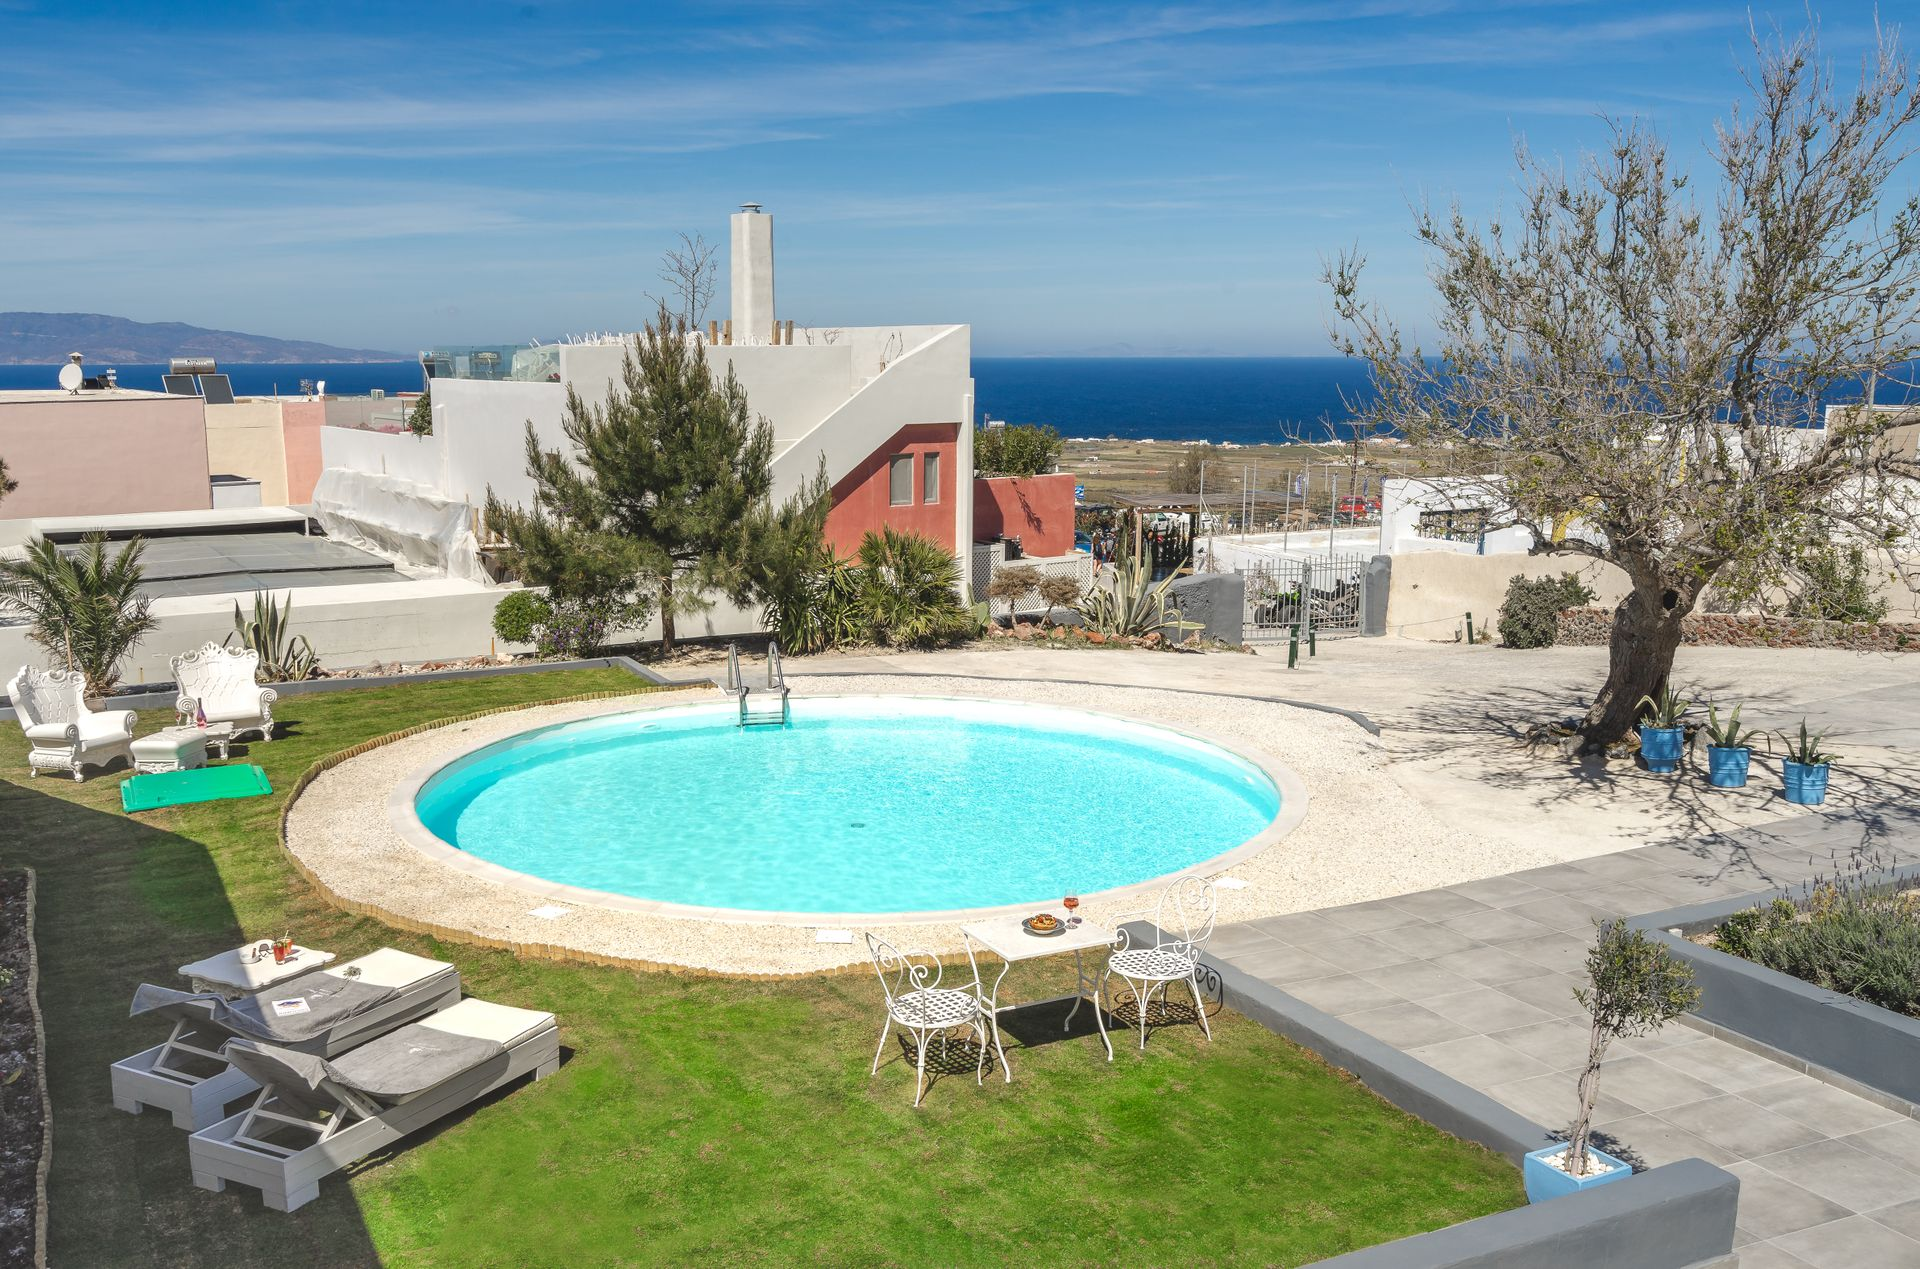 4* La Maltese Oia Luxury Suites - Σαντορίνη ✦ -15% ✦ 4 Ημέρες (3 Διανυκτερεύσεις) ✦ 2 άτομα ✦ Πρωινό ✦ 01/09/2020 έως 30/09/2020 ✦ Υπέροχη Τοποθεσία!